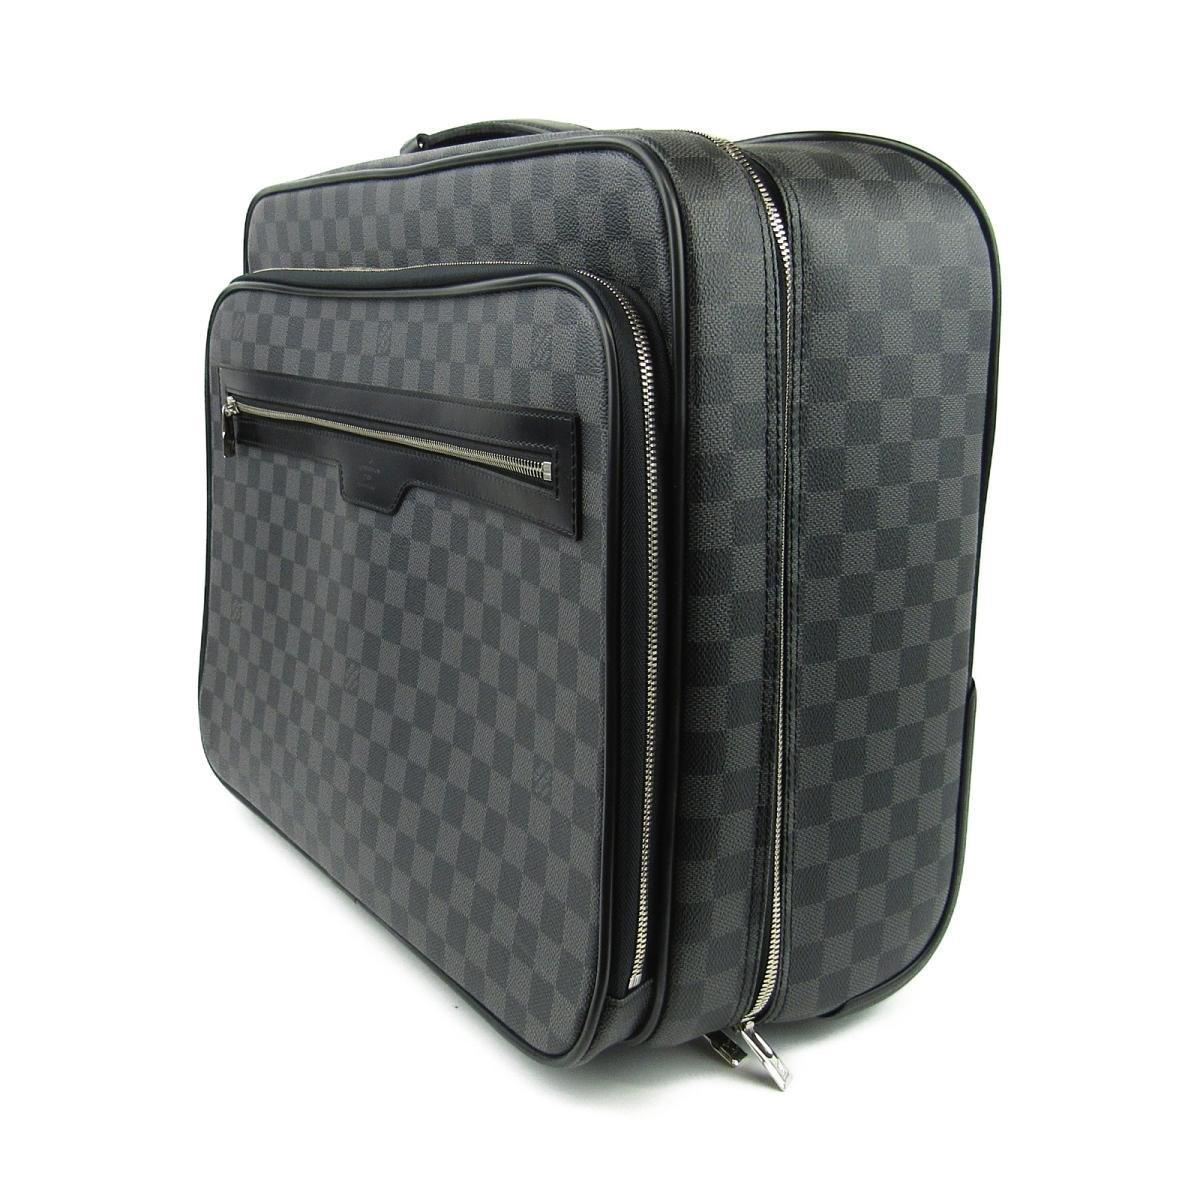 1b2188c0323 Lyst - Louis Vuitton Pilot Case Roller Travel Bag N23206 Damier ...